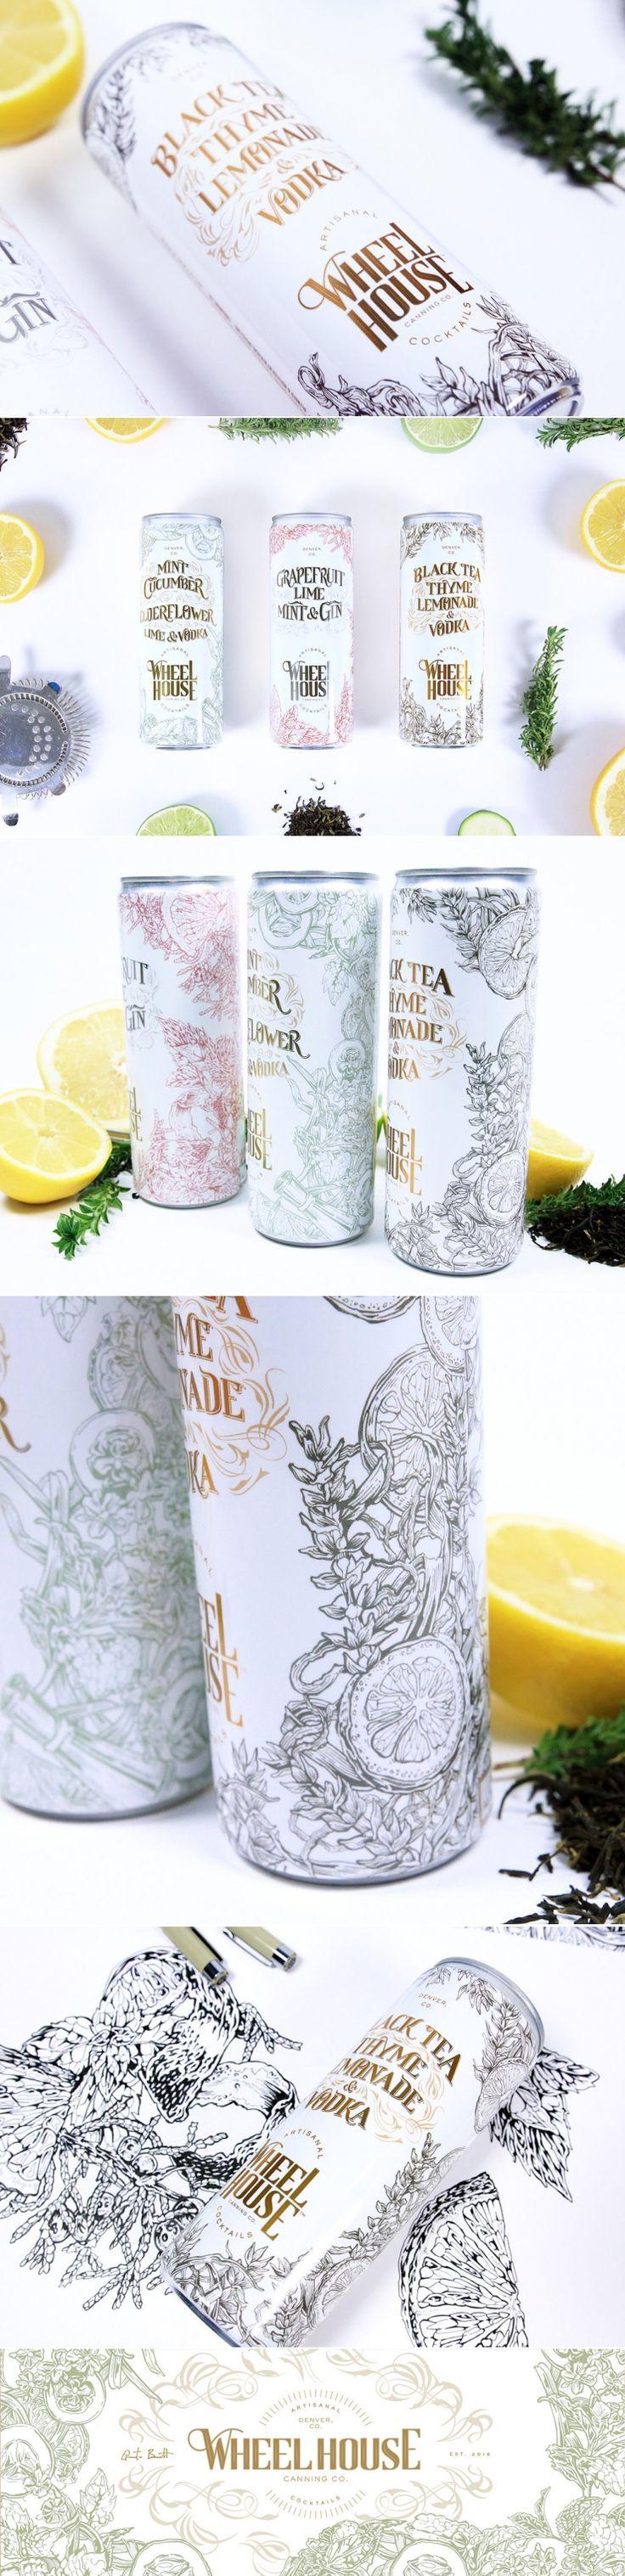 Wheelhouse Makes Canned Cocktails Look So Elegant — The Dieline - Branding & Packaging Design